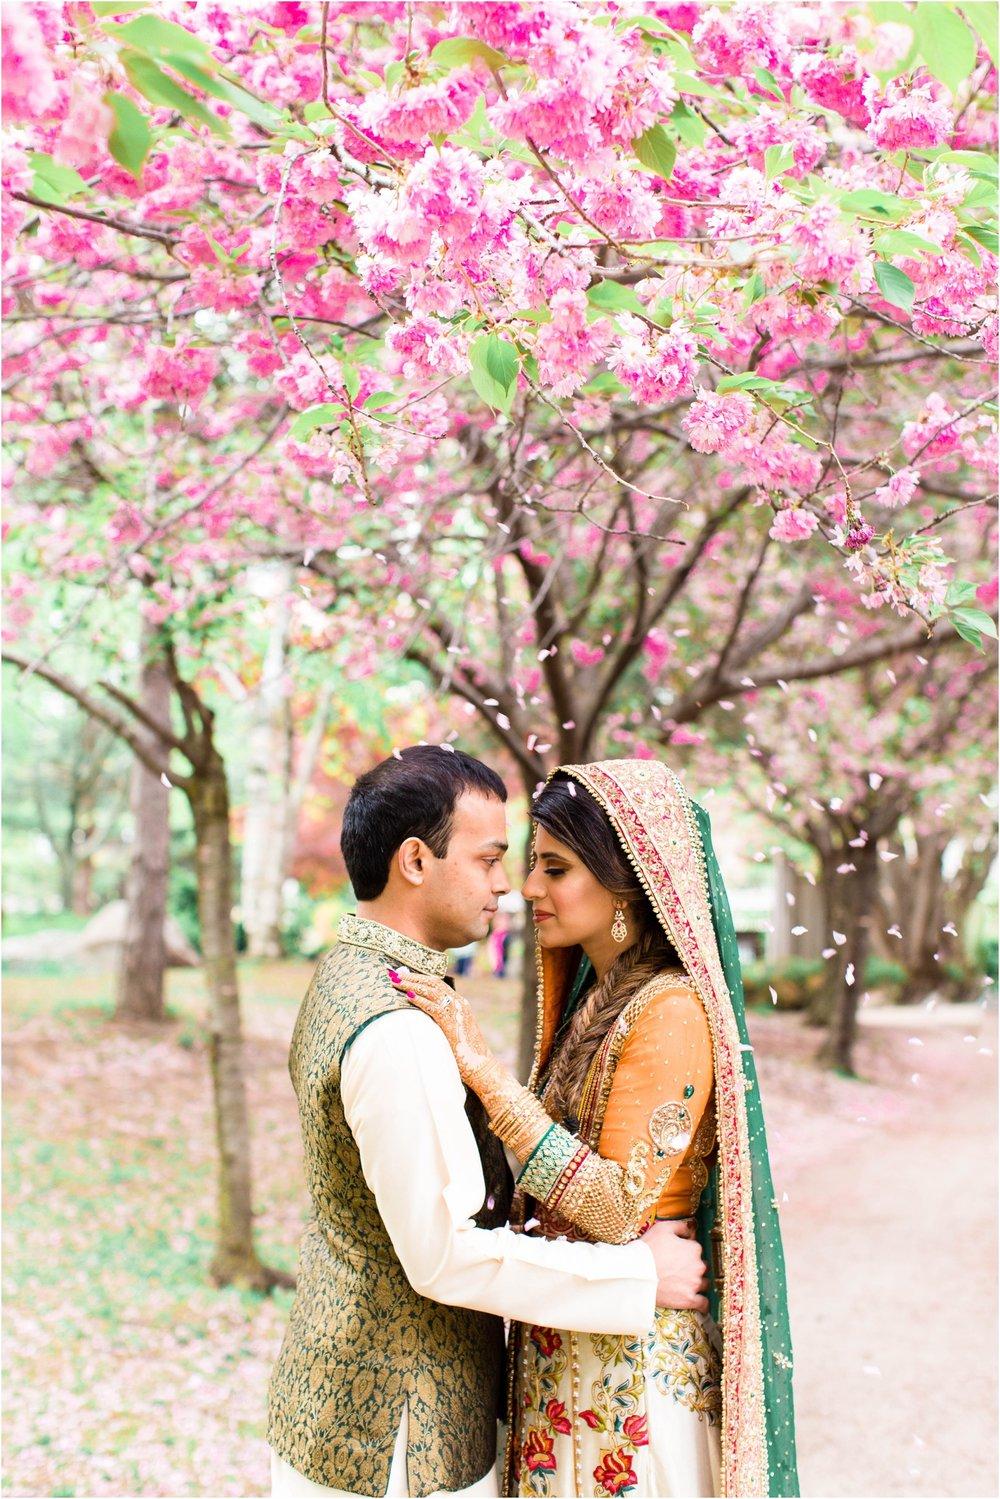 Best-of-2017-Weddings-Toronto-Mississauga-Brampton-Scarborough-GTA-Pakistani-Indian-Wedding-Engagement-Photographer-Photography_0034.jpg